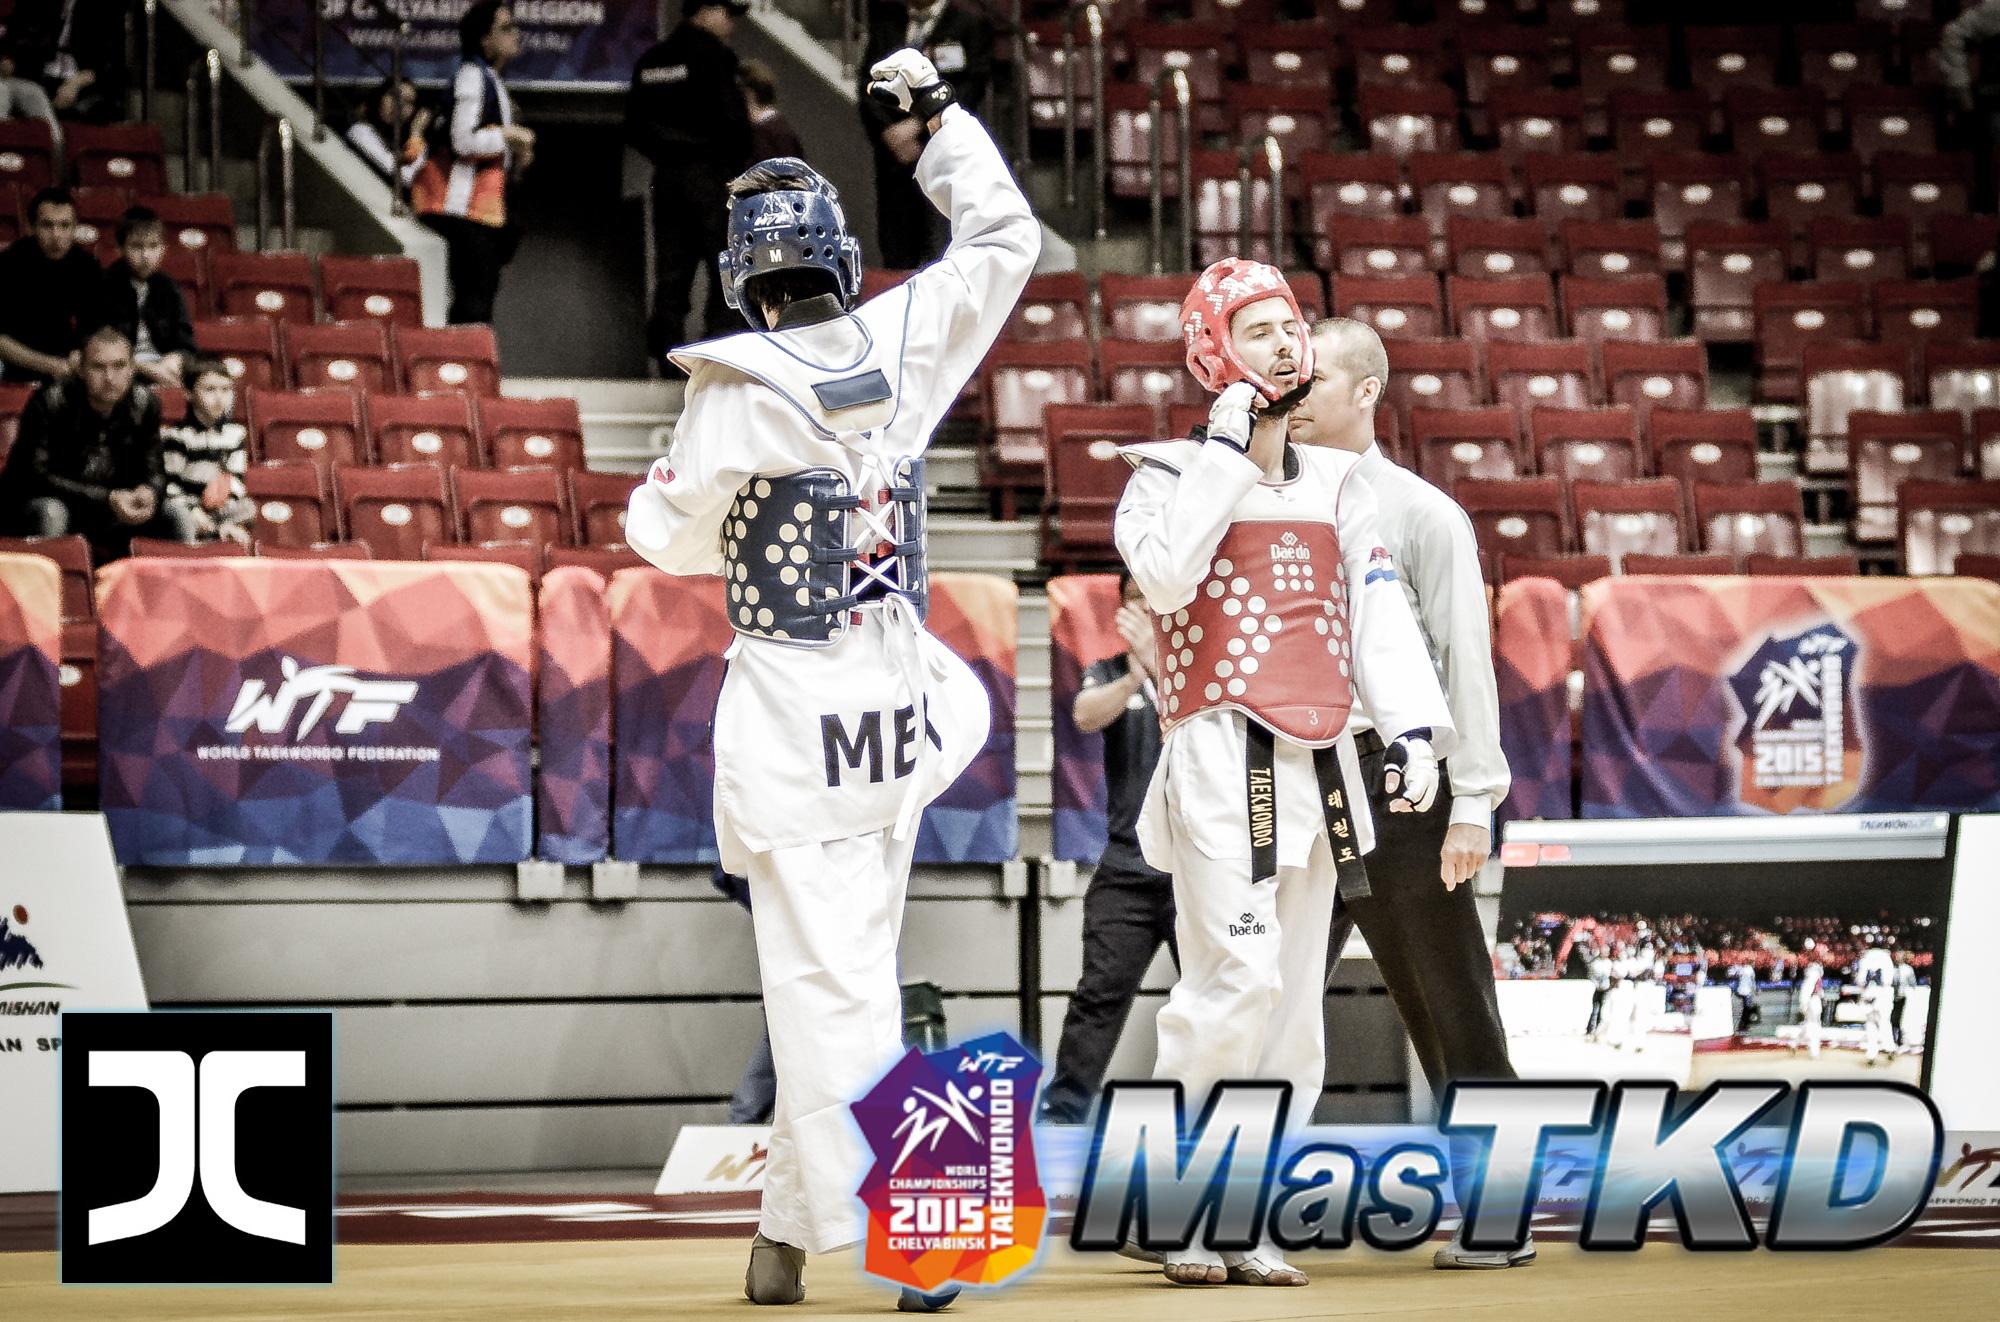 08_Mundial-Taekwondo_JCalicu-Seleccion-Mejor-Foto